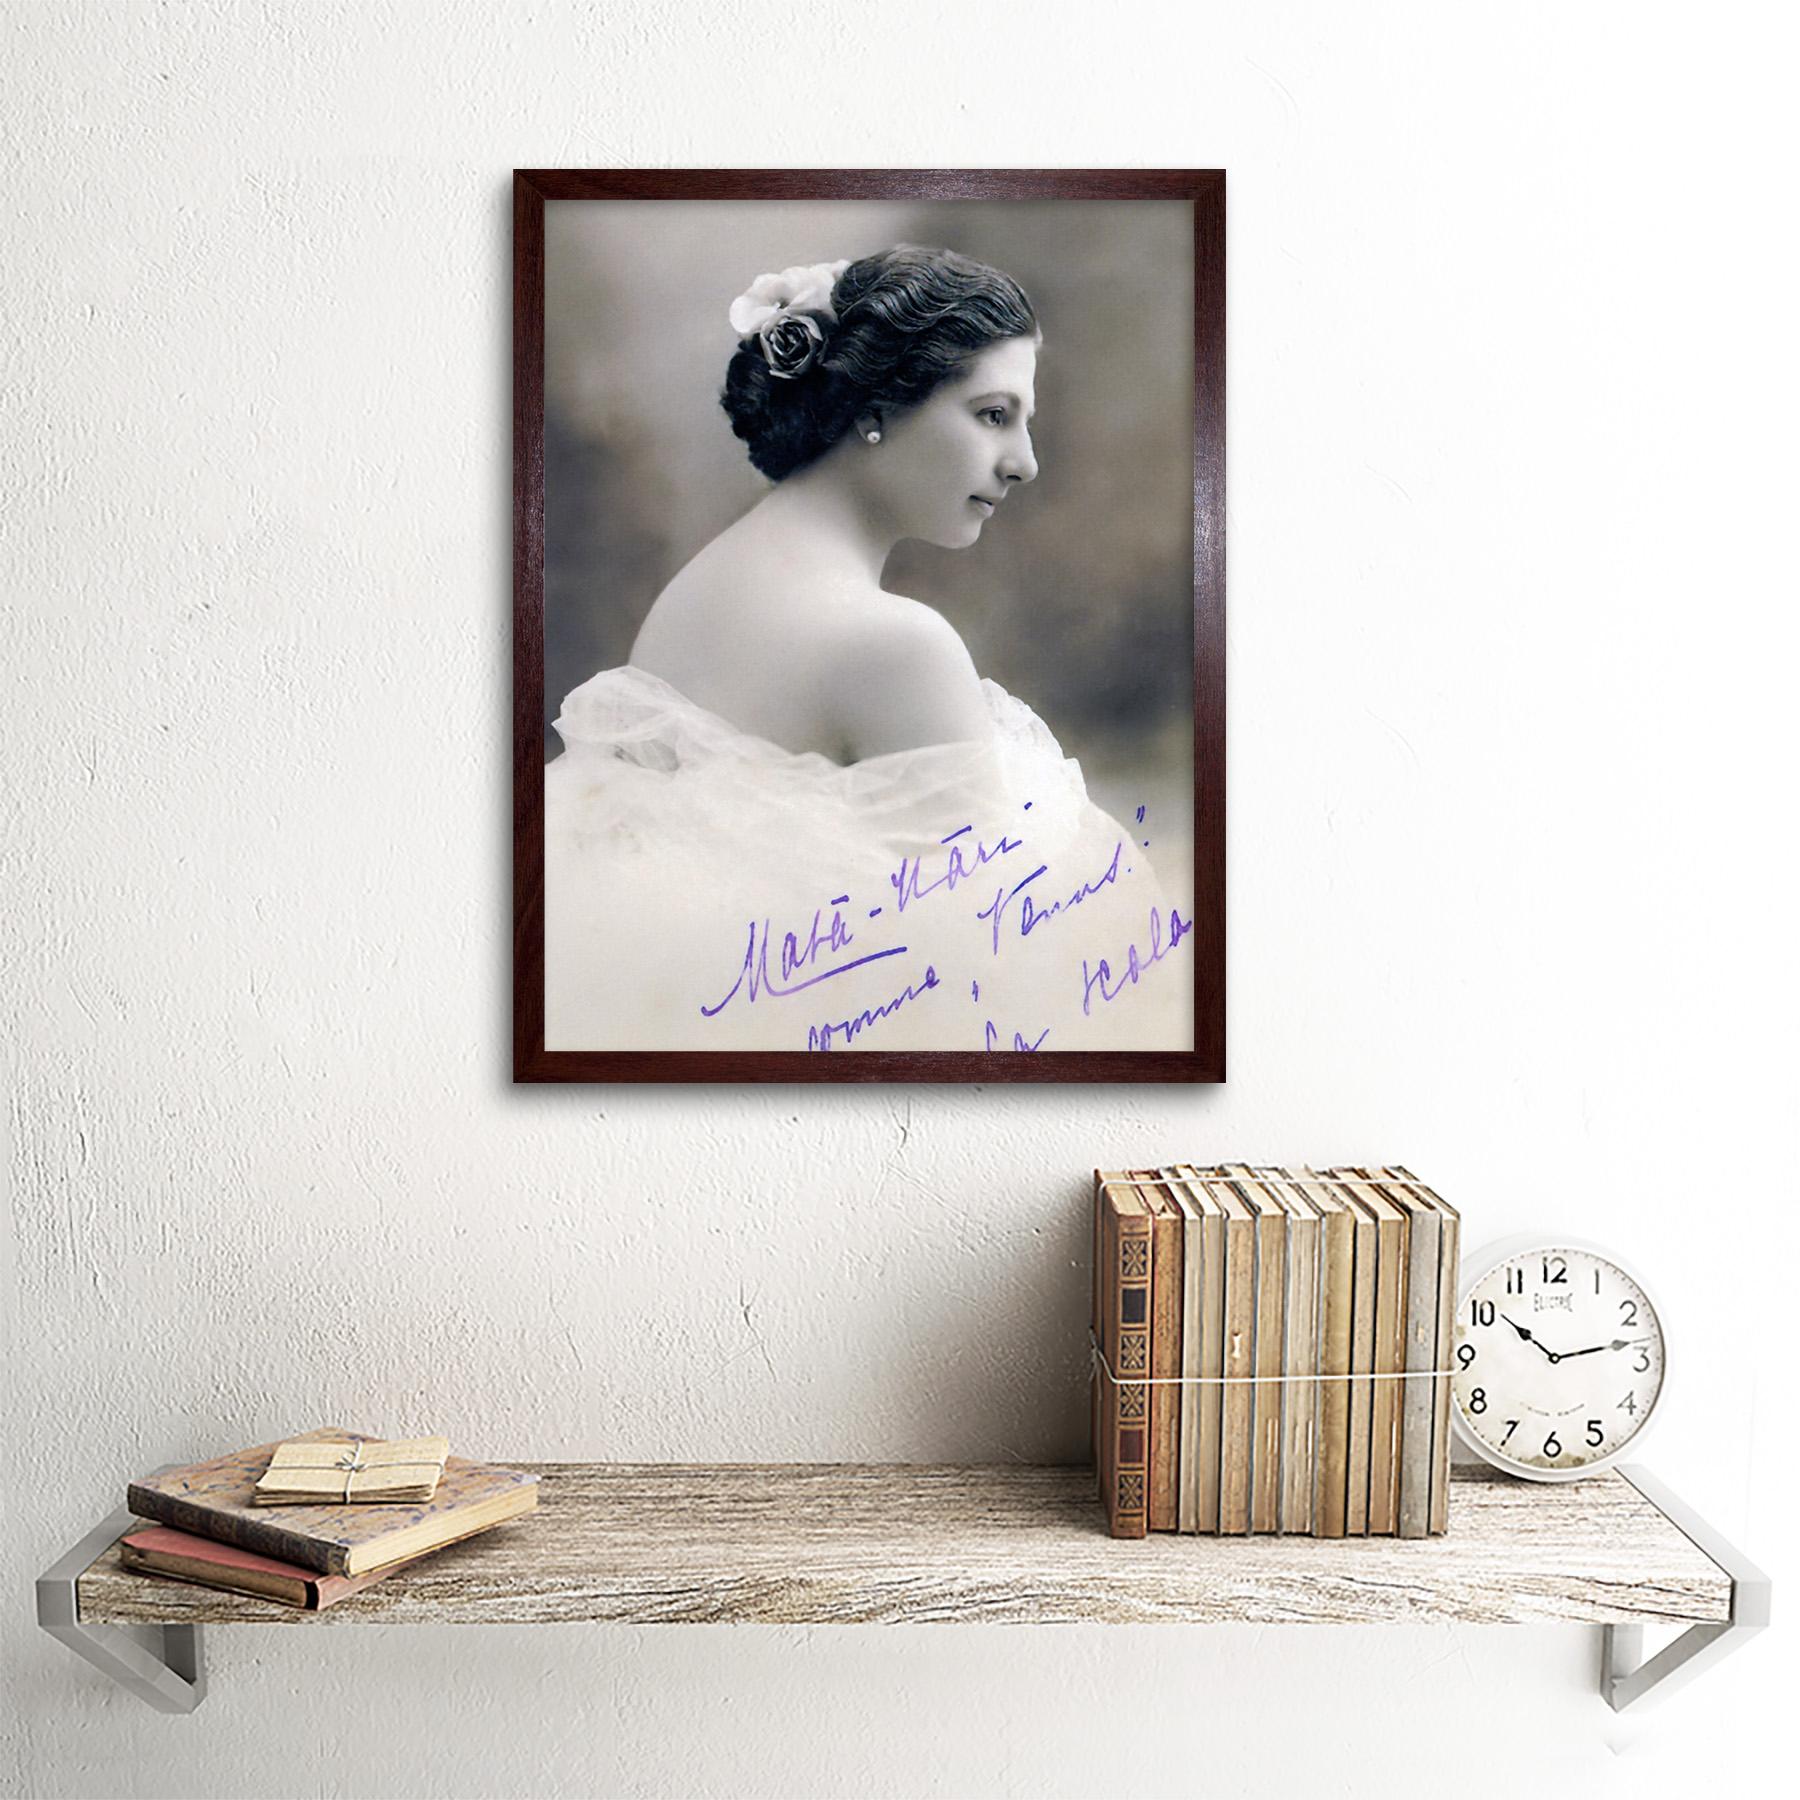 Autographed-Portrait-Dancer-Spy-Mata-Hari-Photo-Framed-Wall-Art-Poster thumbnail 8